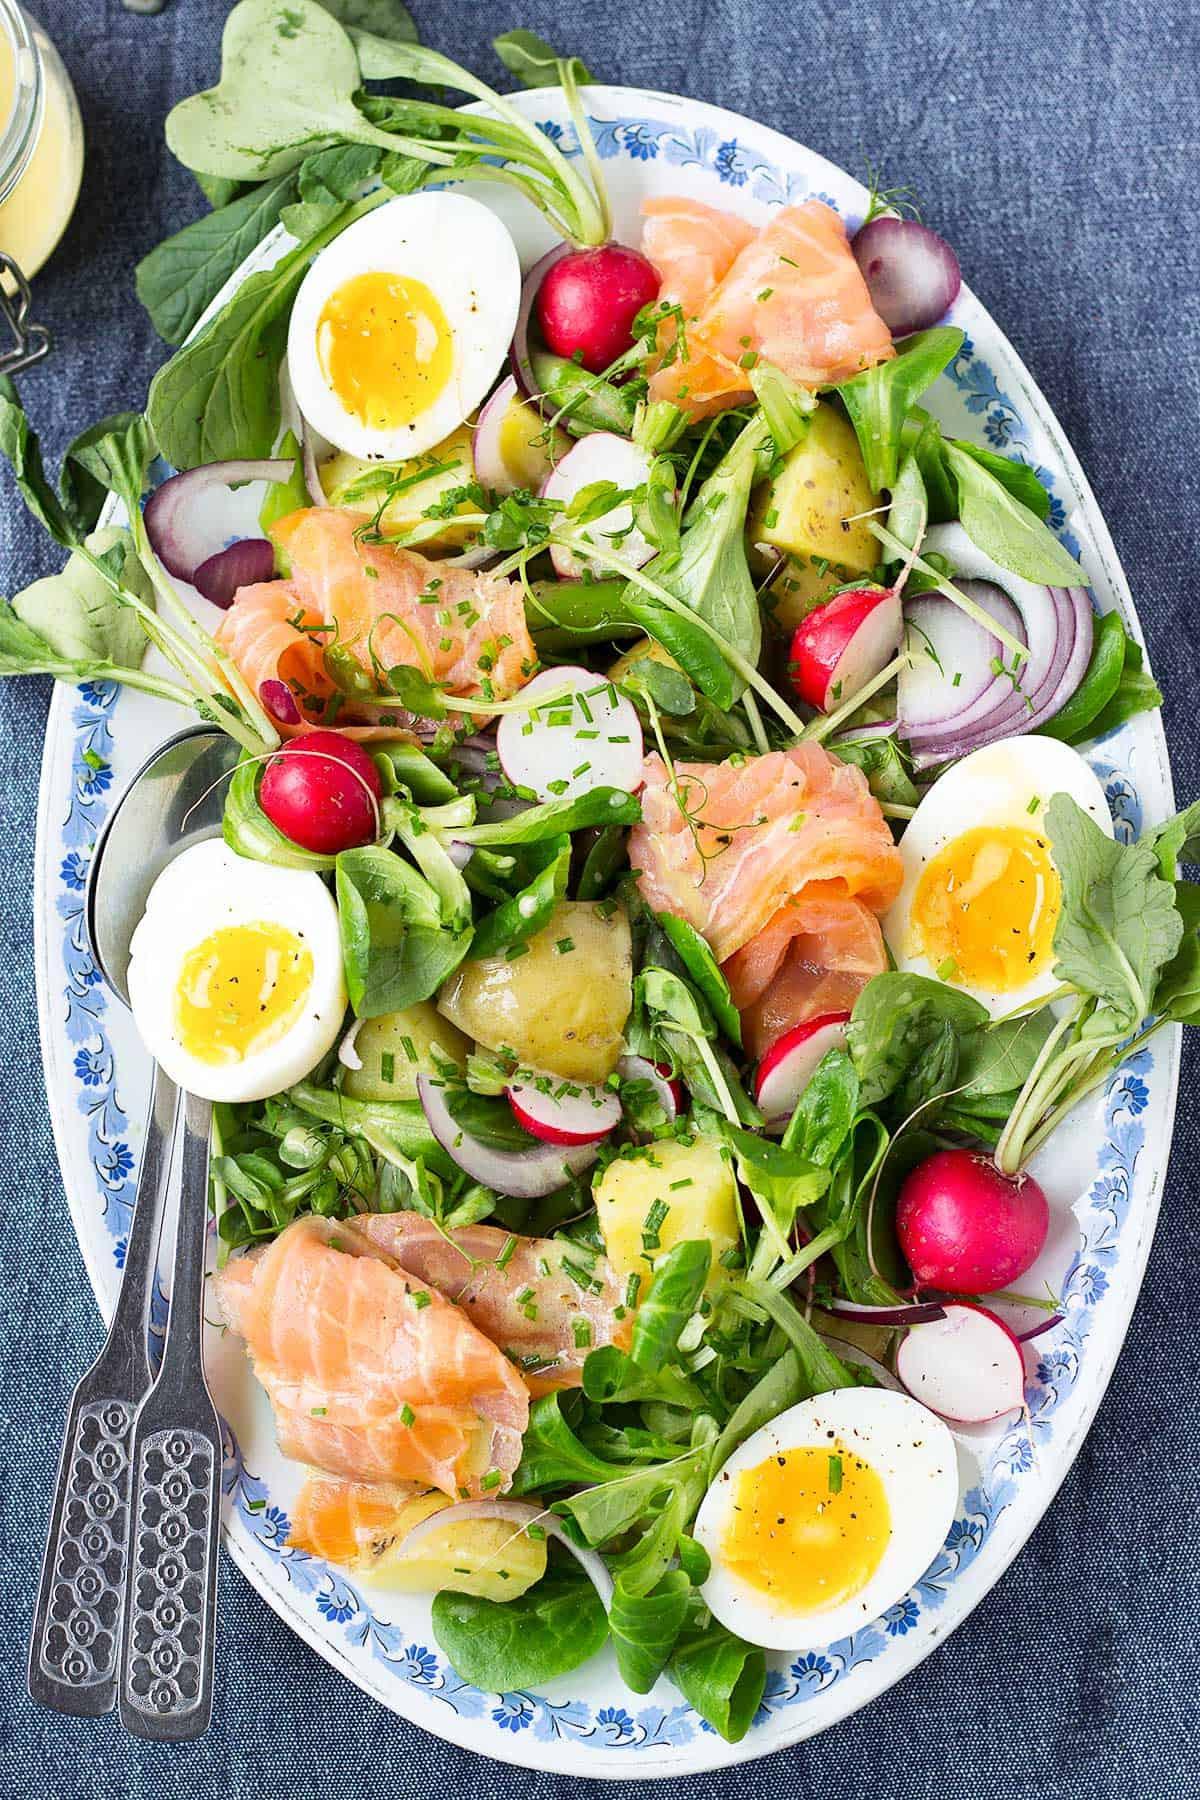 Salmon Salad Recipe Healthy  Salmon Salad with Dijon Vinaigrette Nutritionist meets Chef